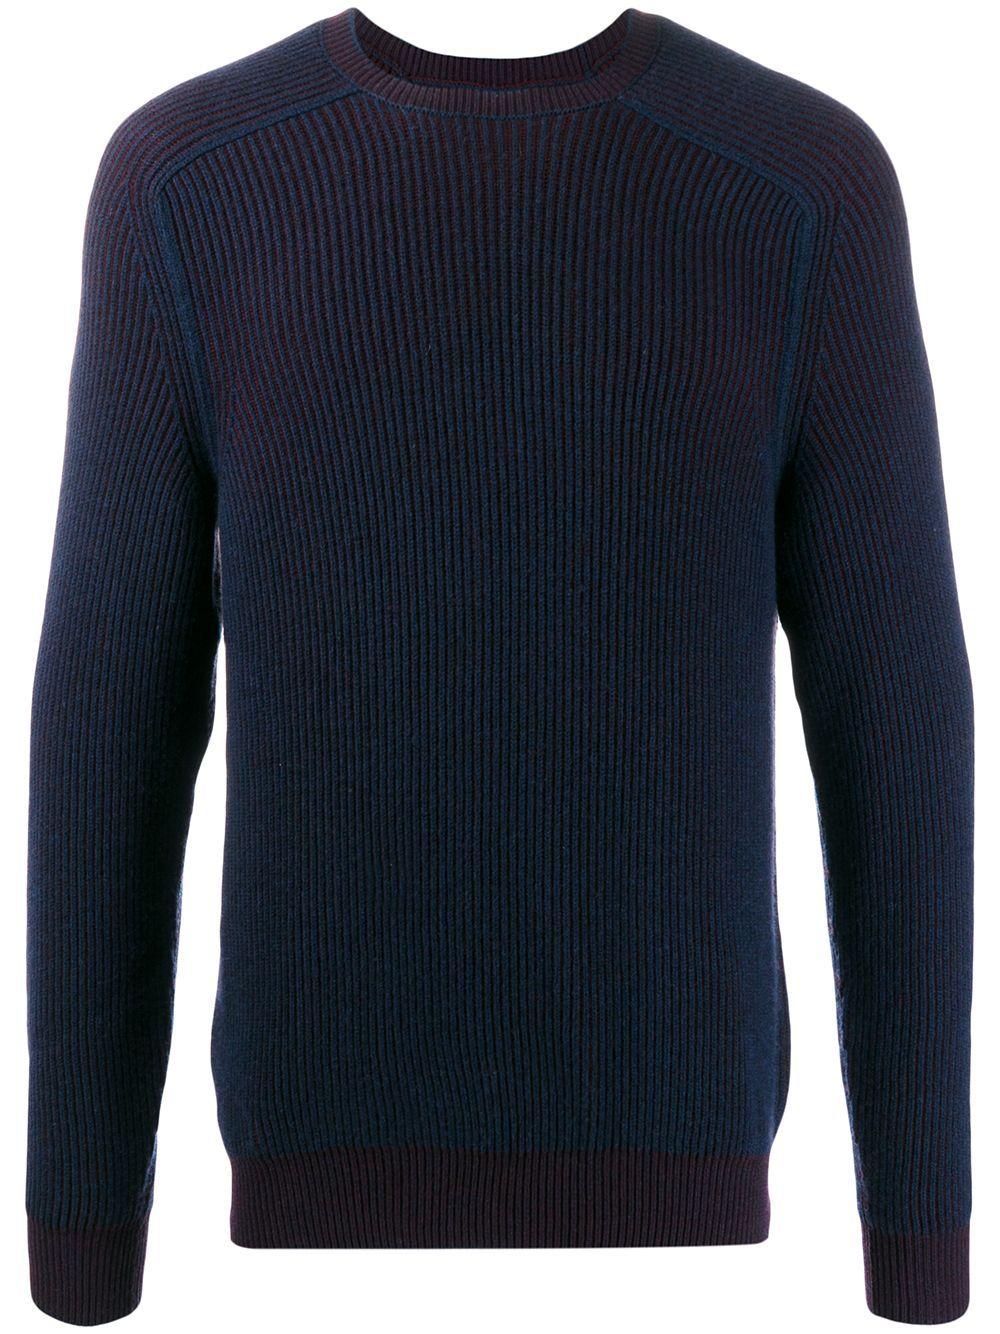 Sease cashmere reversible knit jumper - Blue